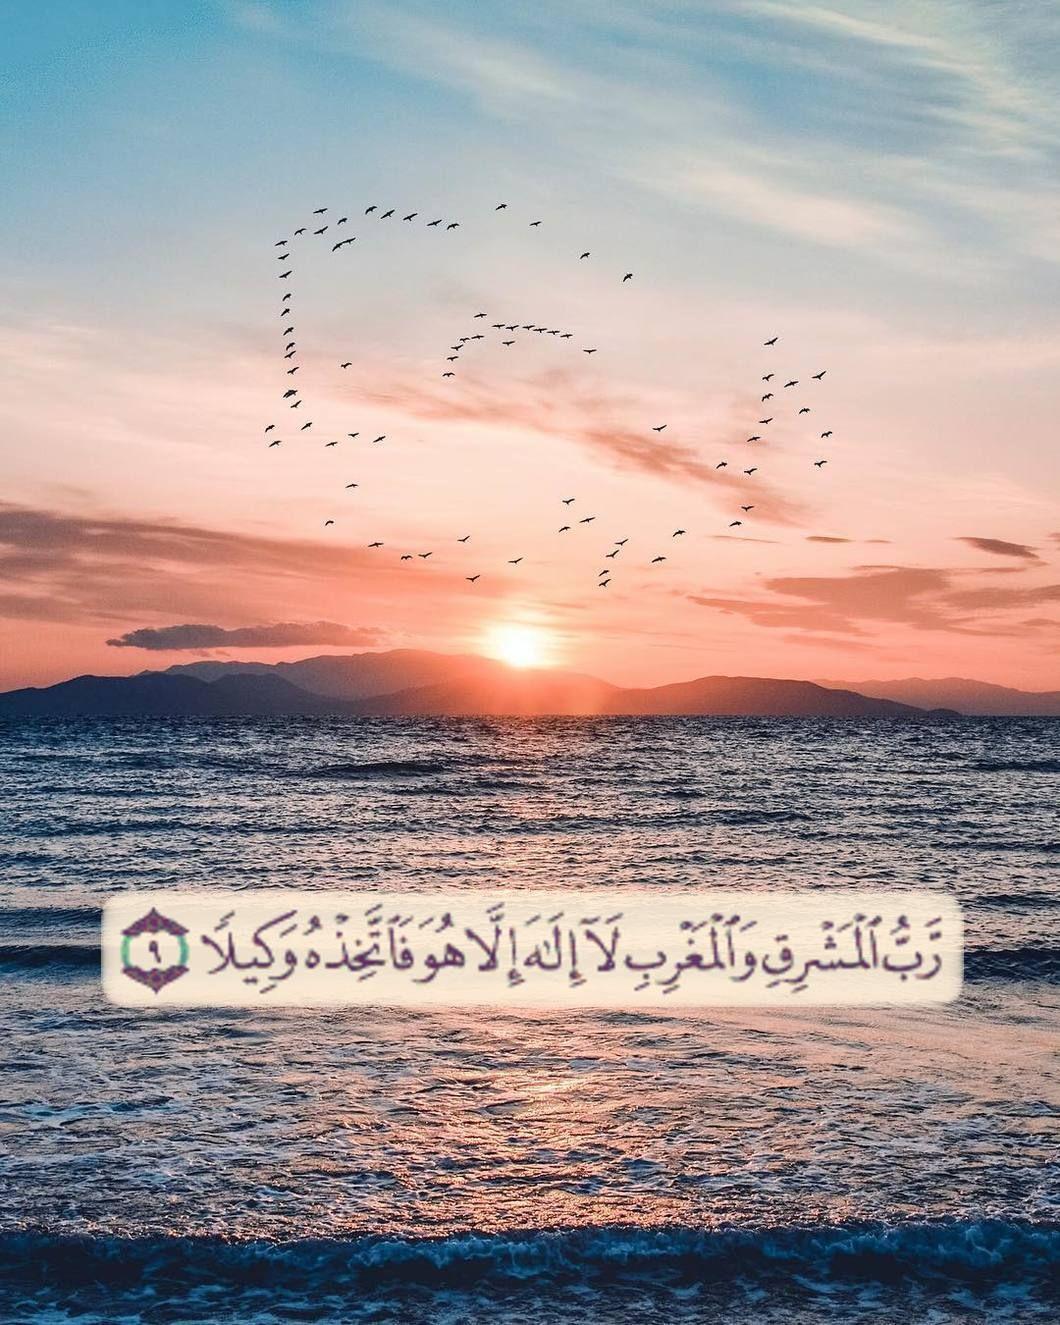 سبحانك ربي Islam Facts Quran Beautiful Pictures